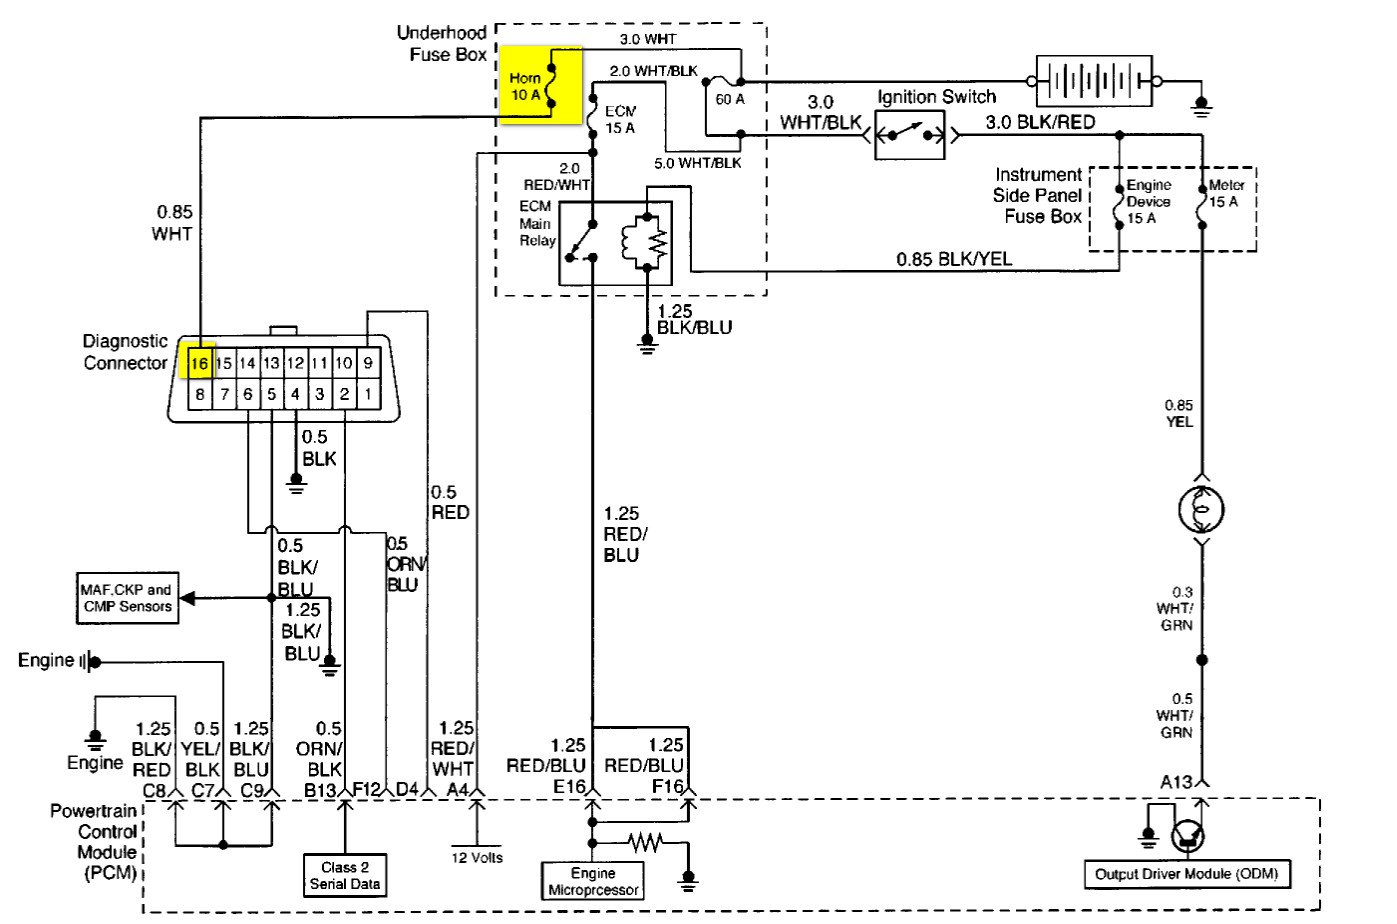 Audi Obd Wiring | Wiring Diagram - Data Link Connector Wiring Diagram